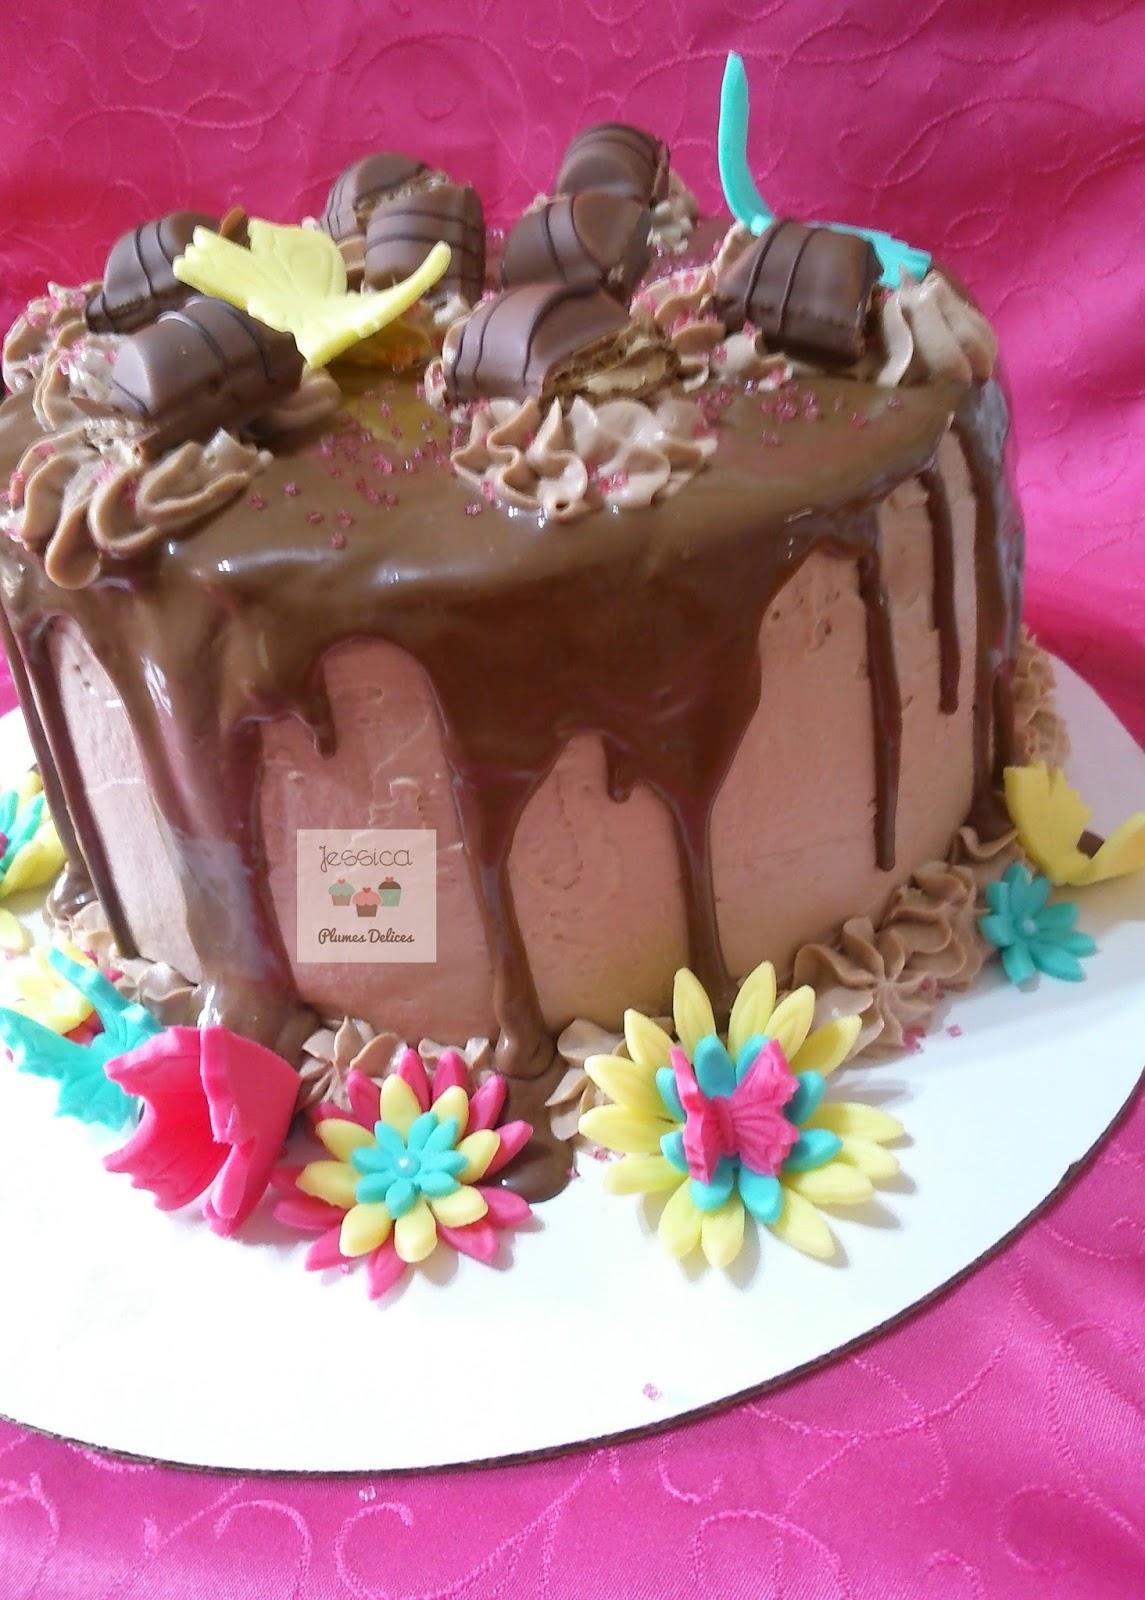 Plumes d lices le layer cake kinder bueno - Gateau deco kinder ...